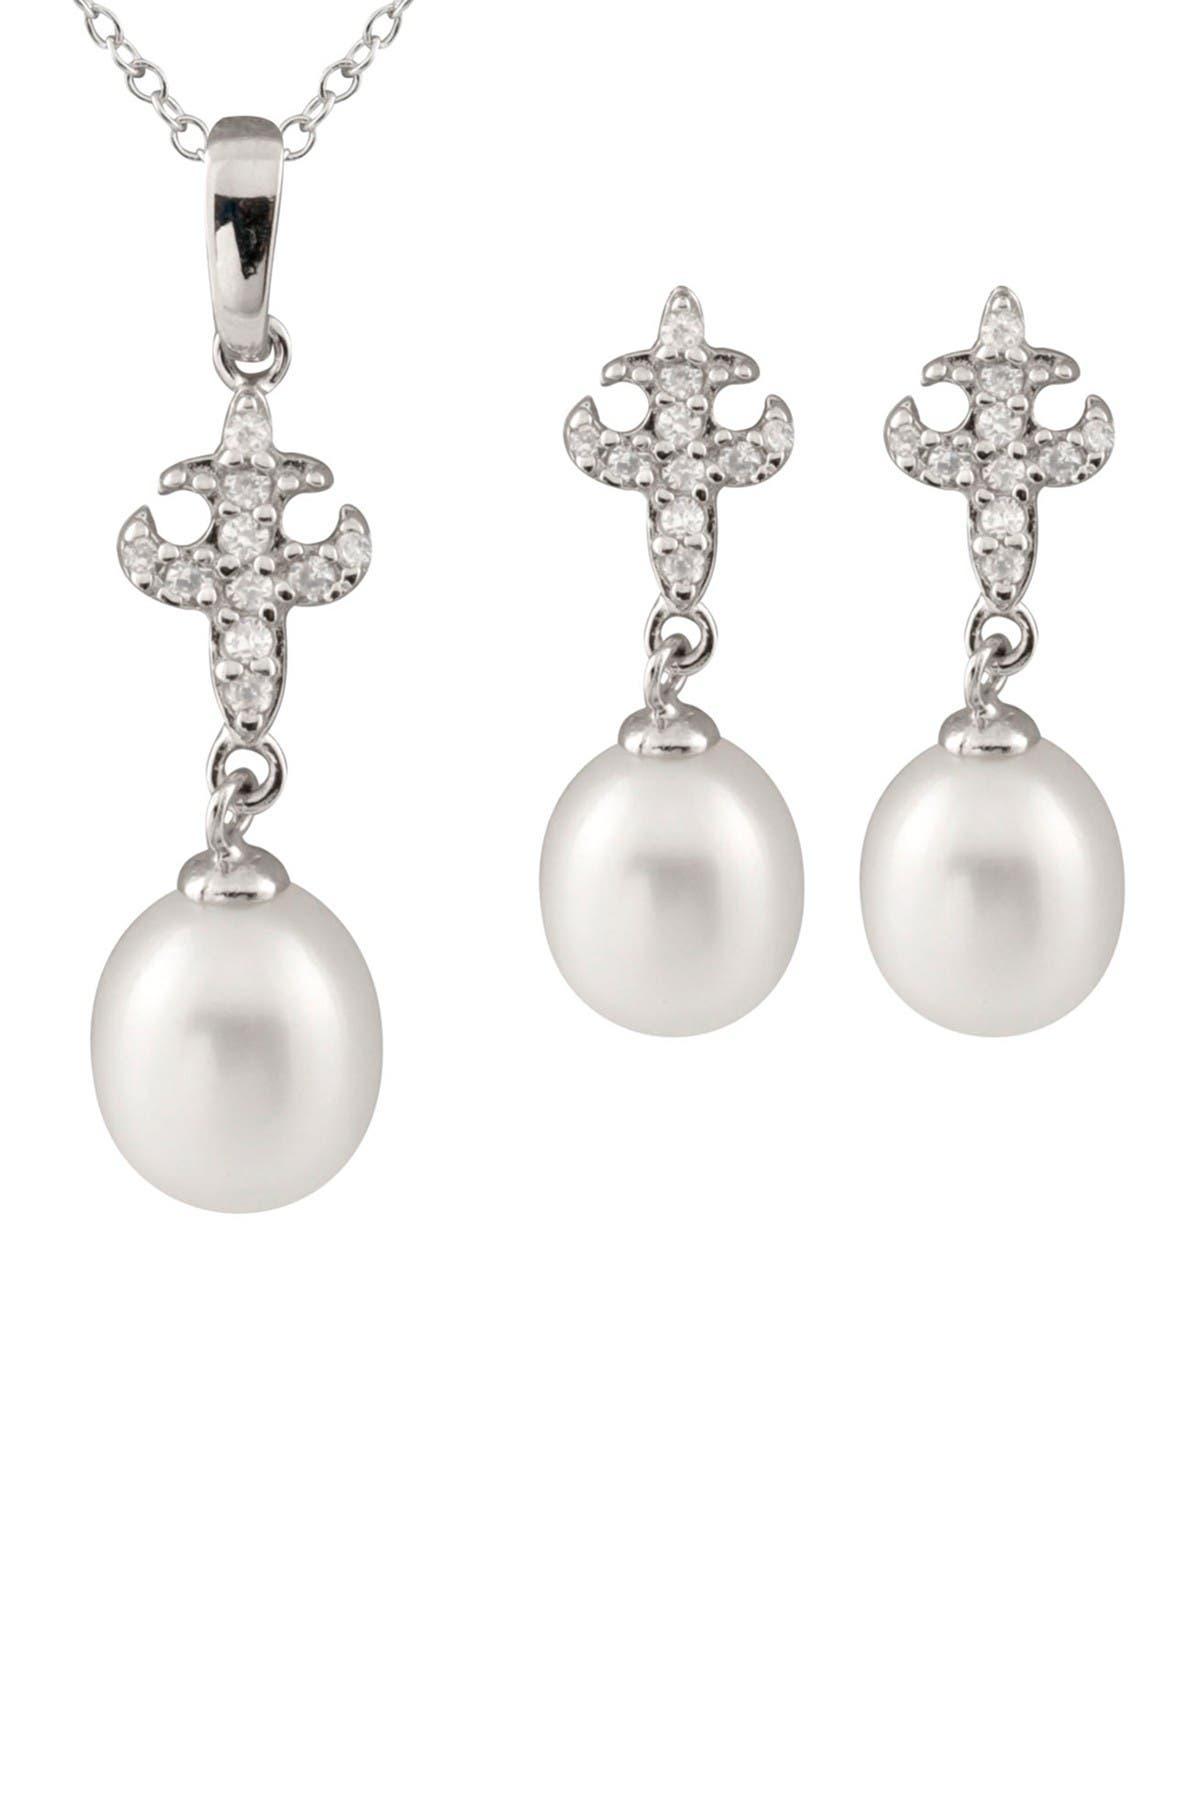 Image of Splendid Pearls 7-8mm Freshwater Pearl Fleur-de-Lis Necklace & Earrings Set